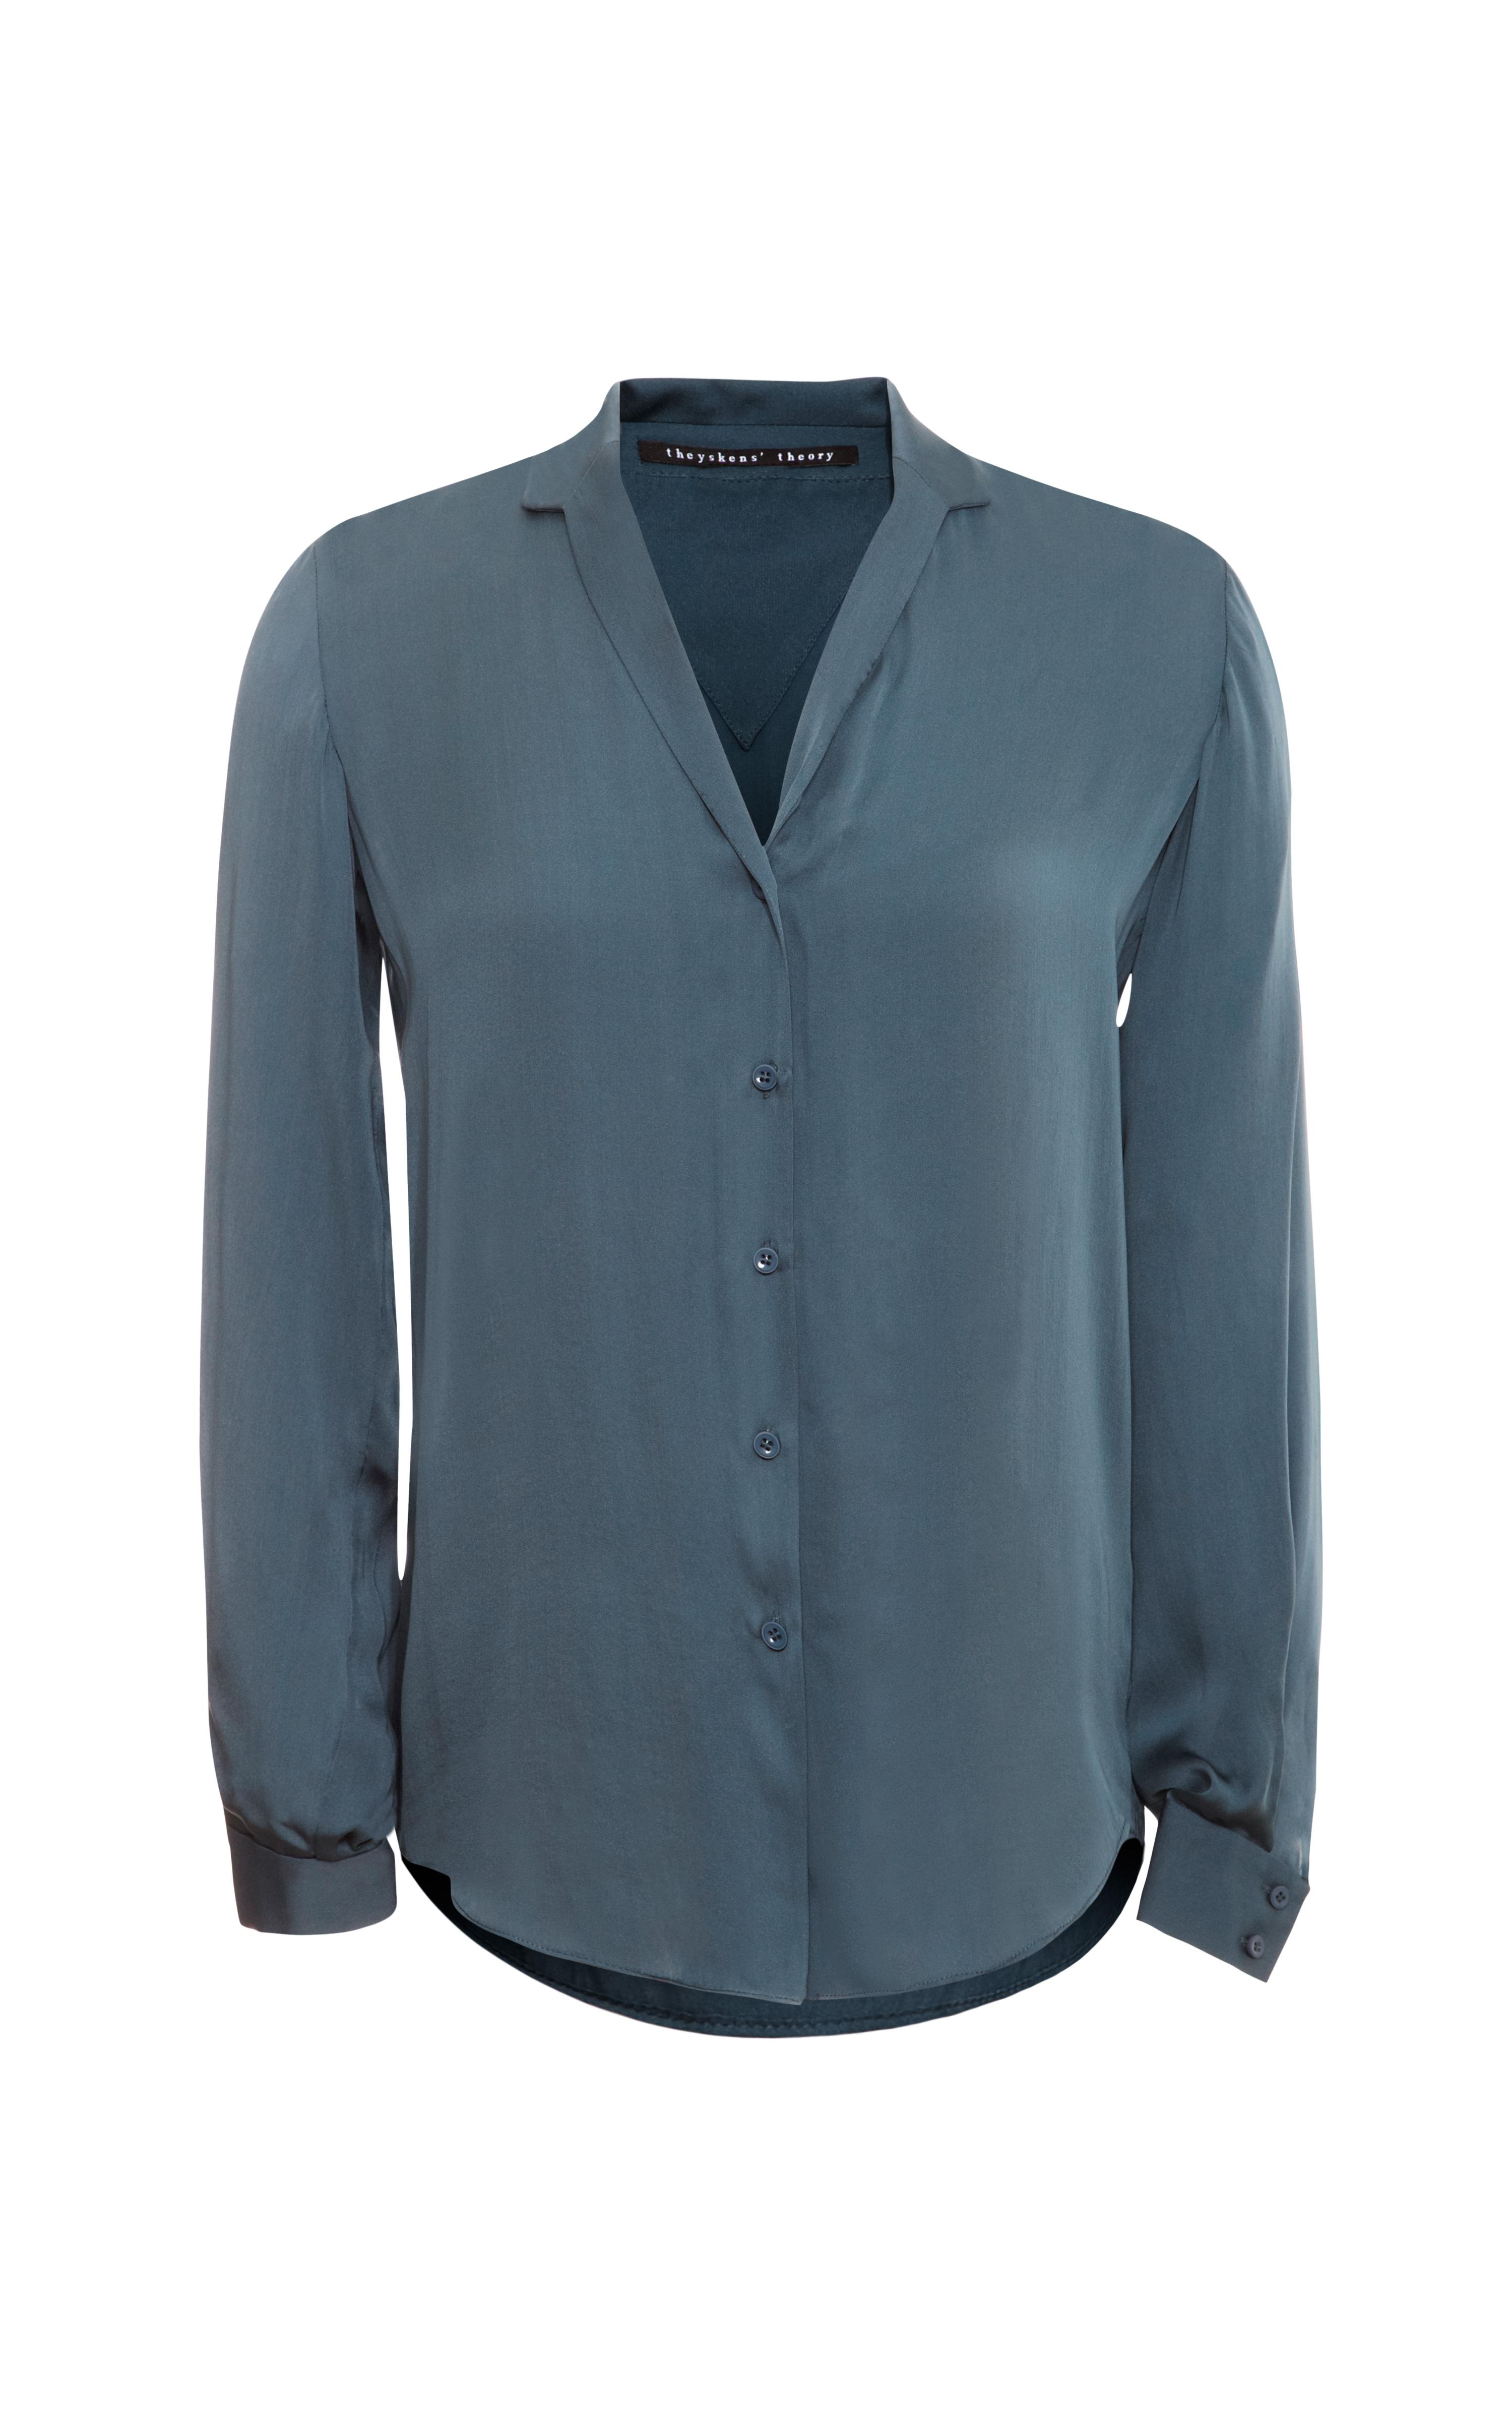 Theyskens 39 theory brana fayl silk button down blouse in for Silk button down shirt